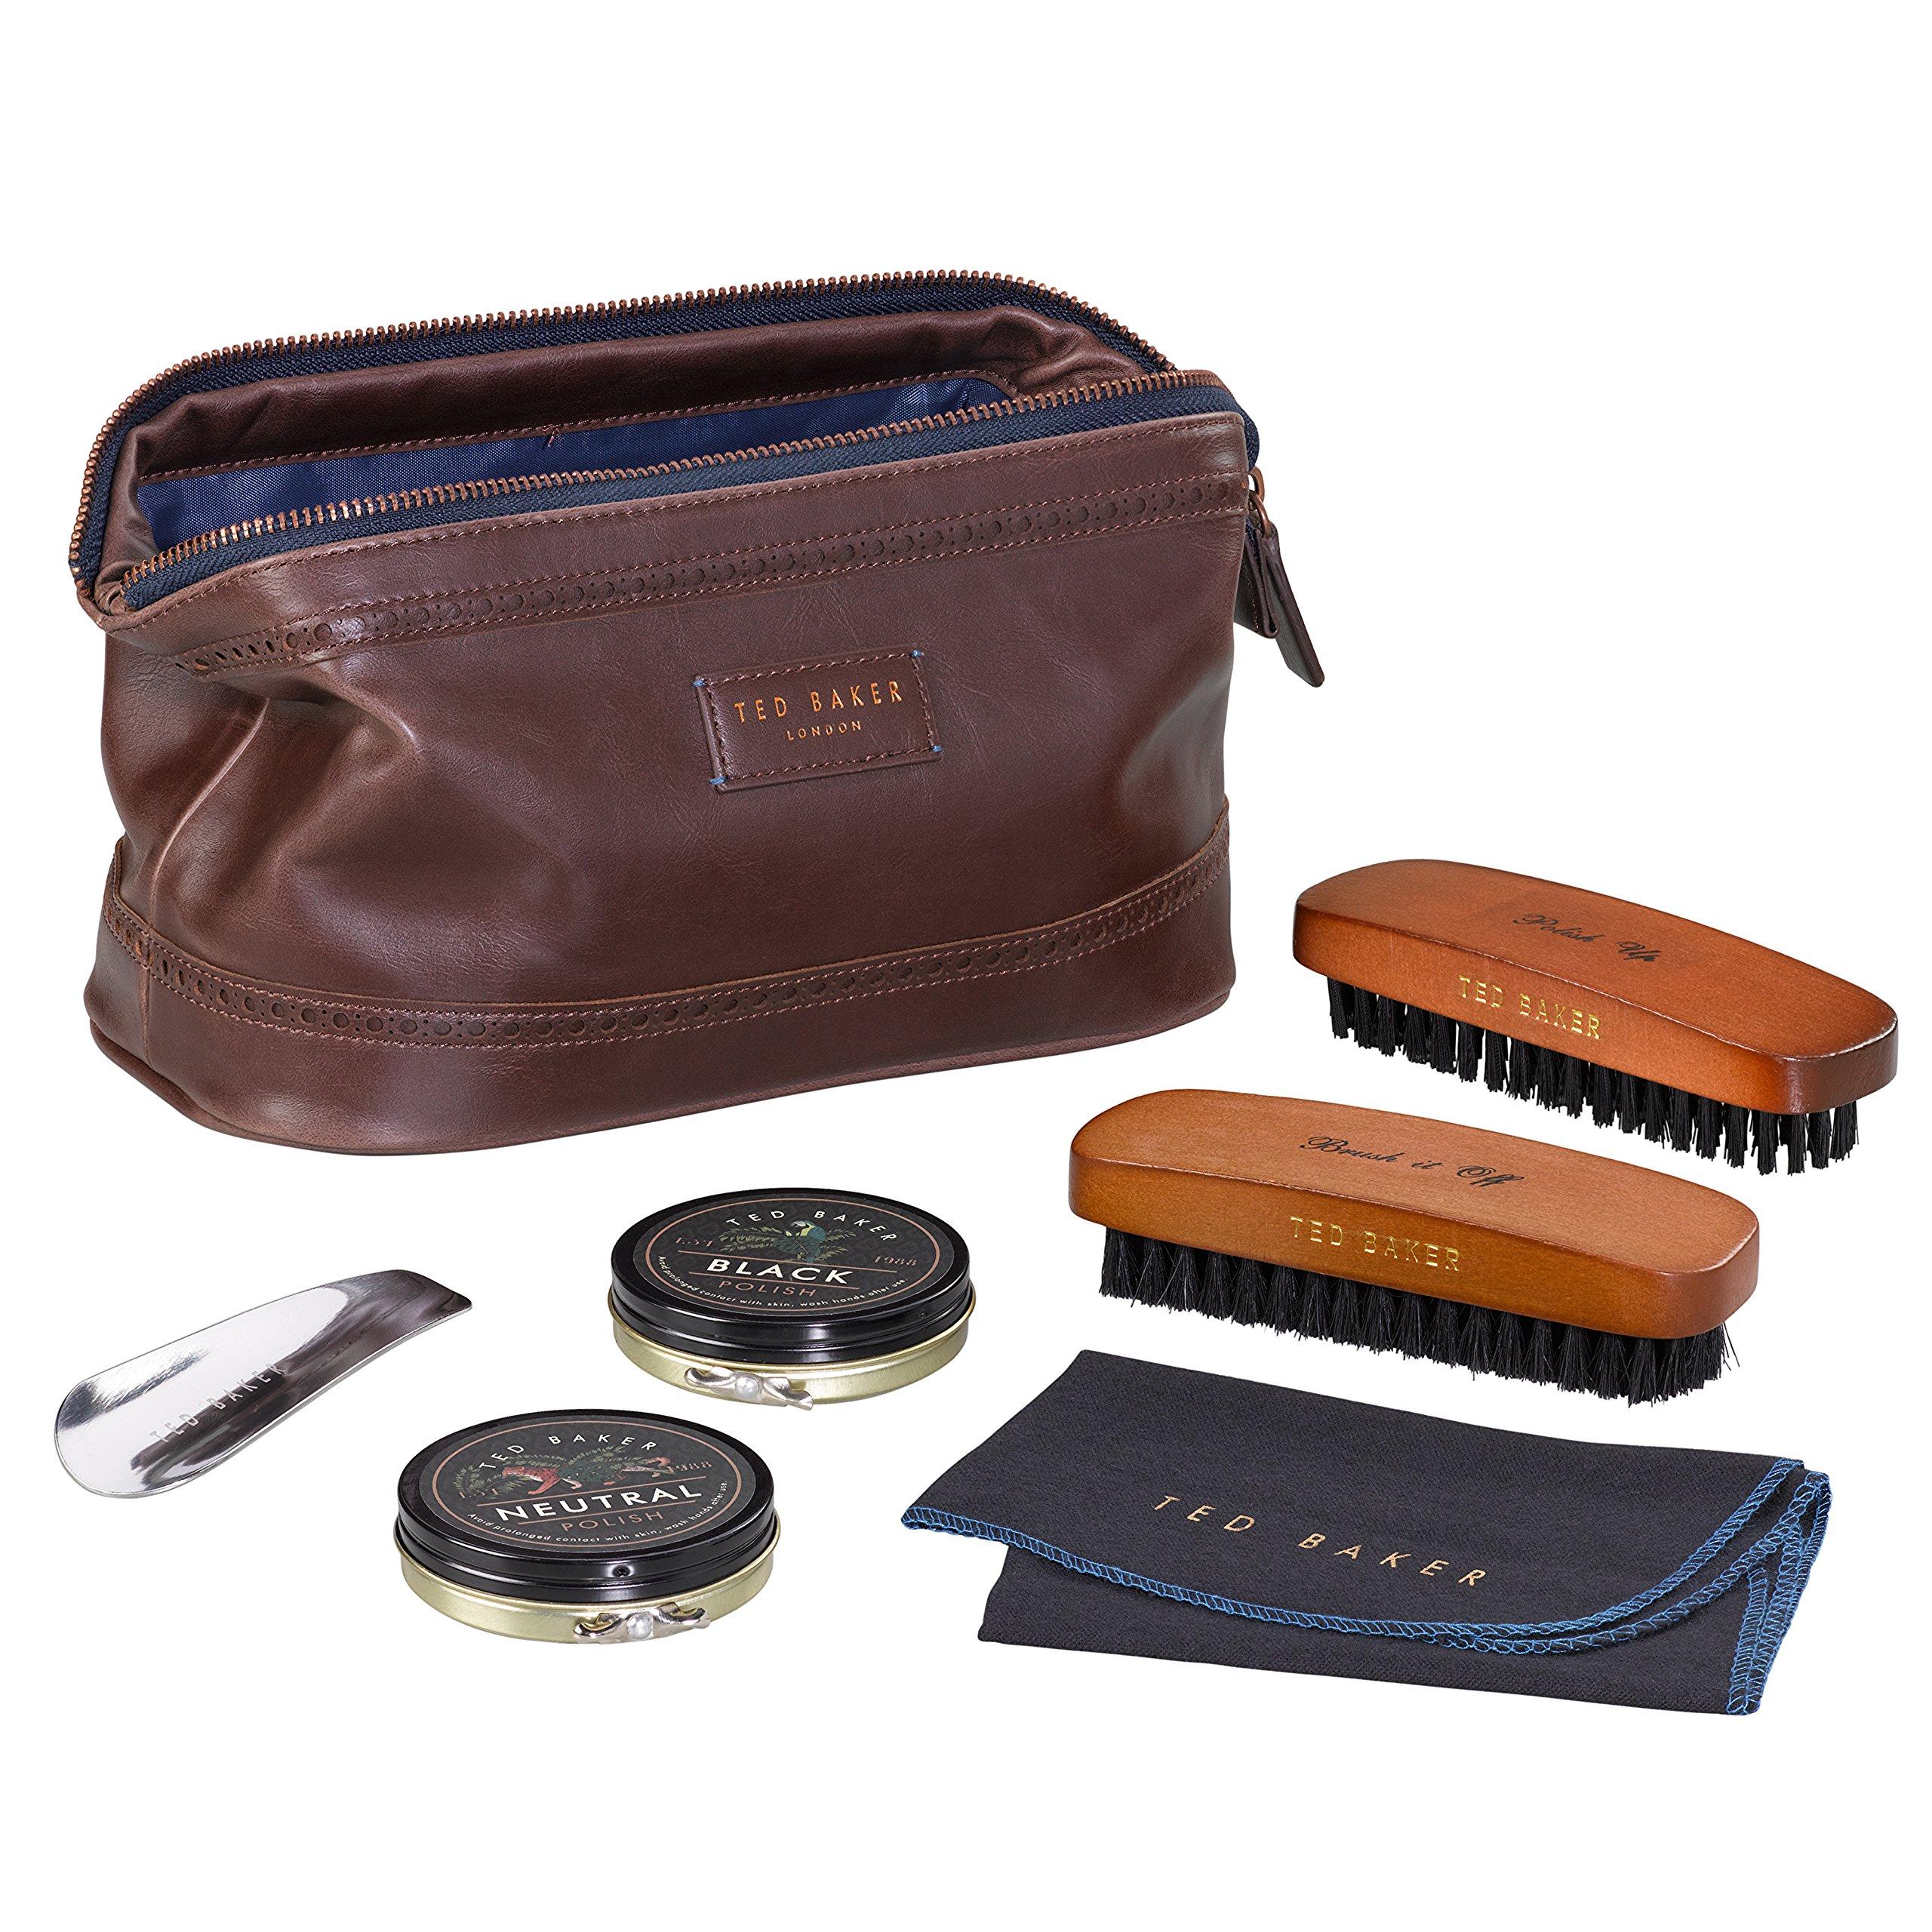 Ted Baker London Shoe Shine Care Kits & Sets (Walnut Brown)